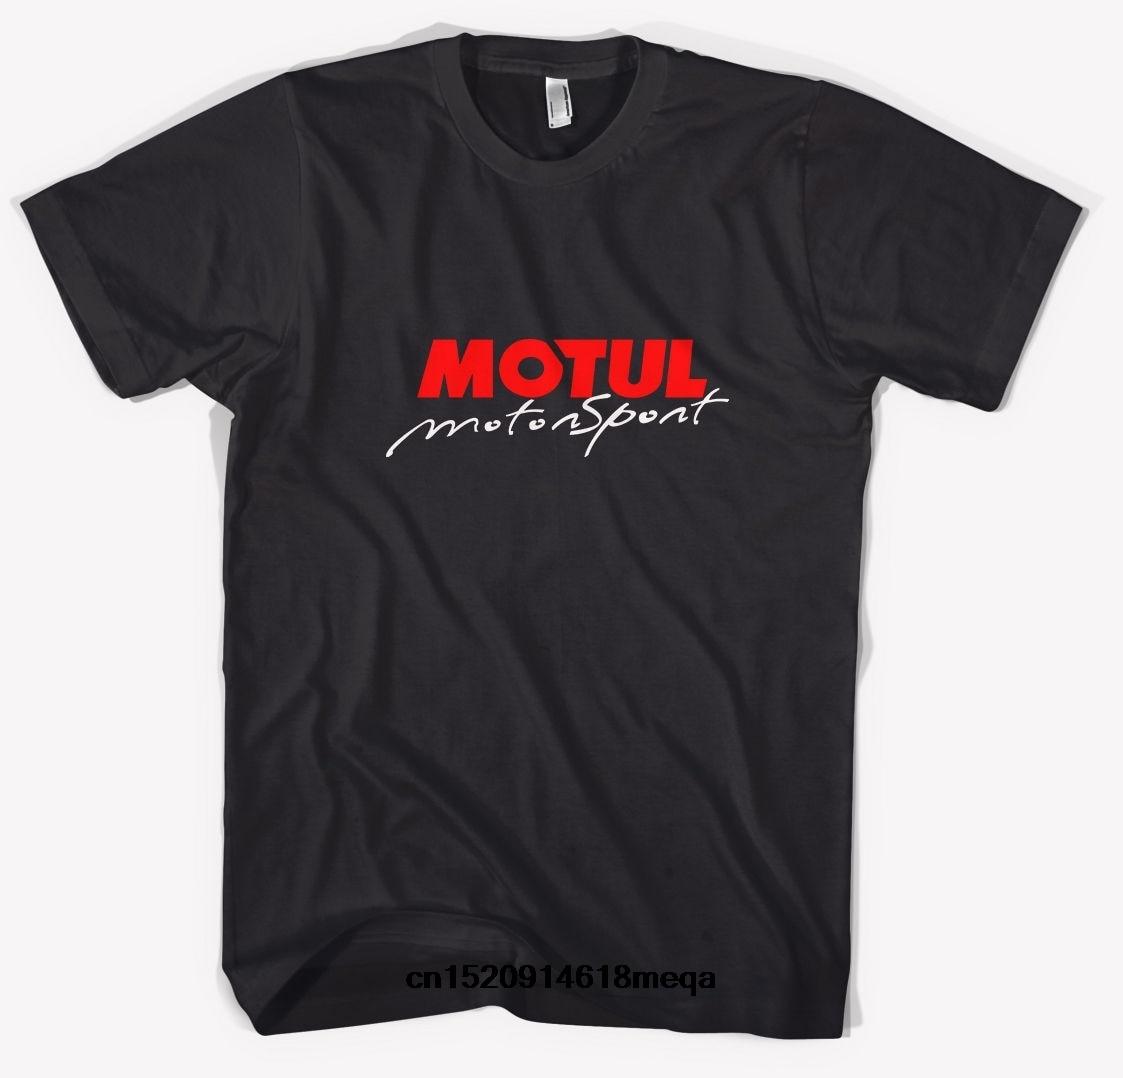 Camiseta Motul Motor negro camiseta para hombre cuello redondo algodón camiseta manga corta ropa